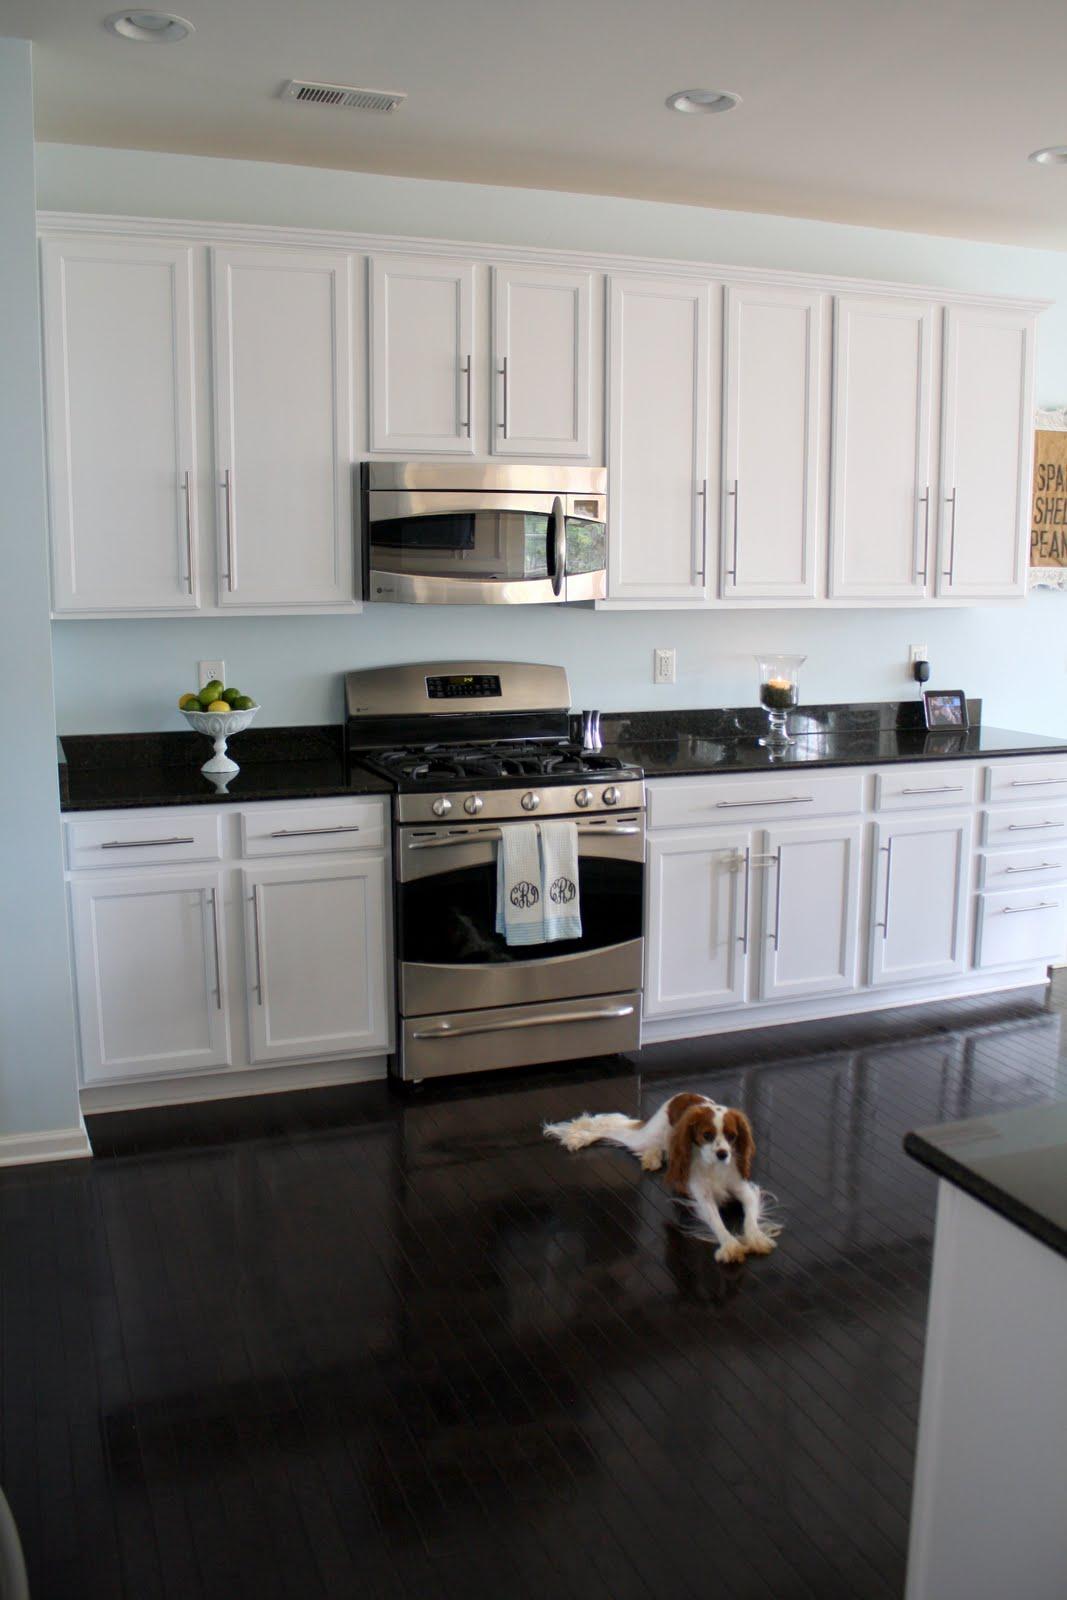 kitchen-white-cabinets-dark-countertops-photo-8